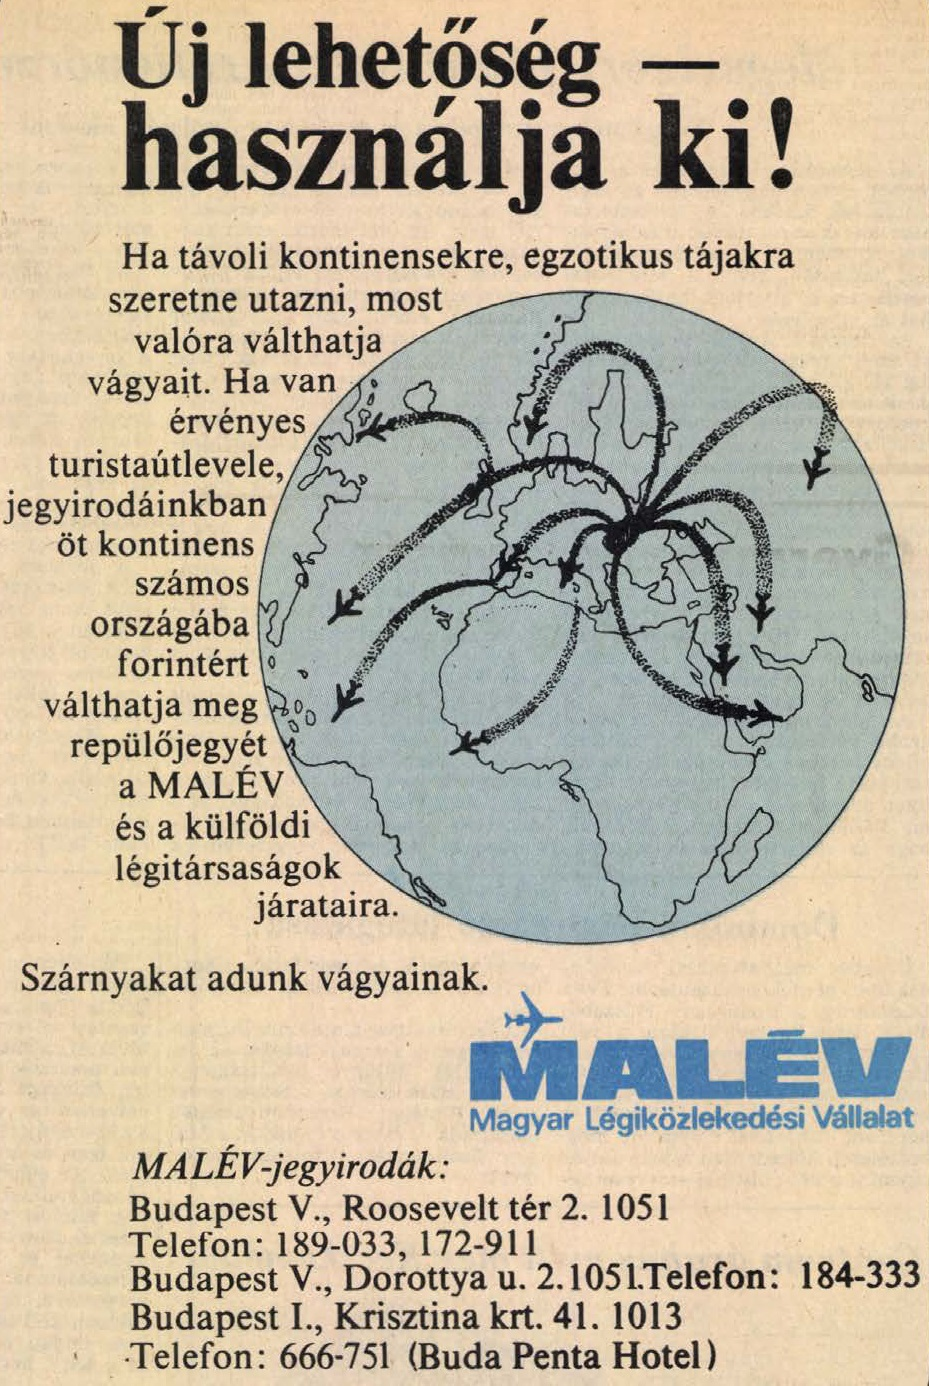 idokapszula_nb_i_1983_84_gorogorszag_magyarorszag_eb-selejtezo_reklam_1.jpg